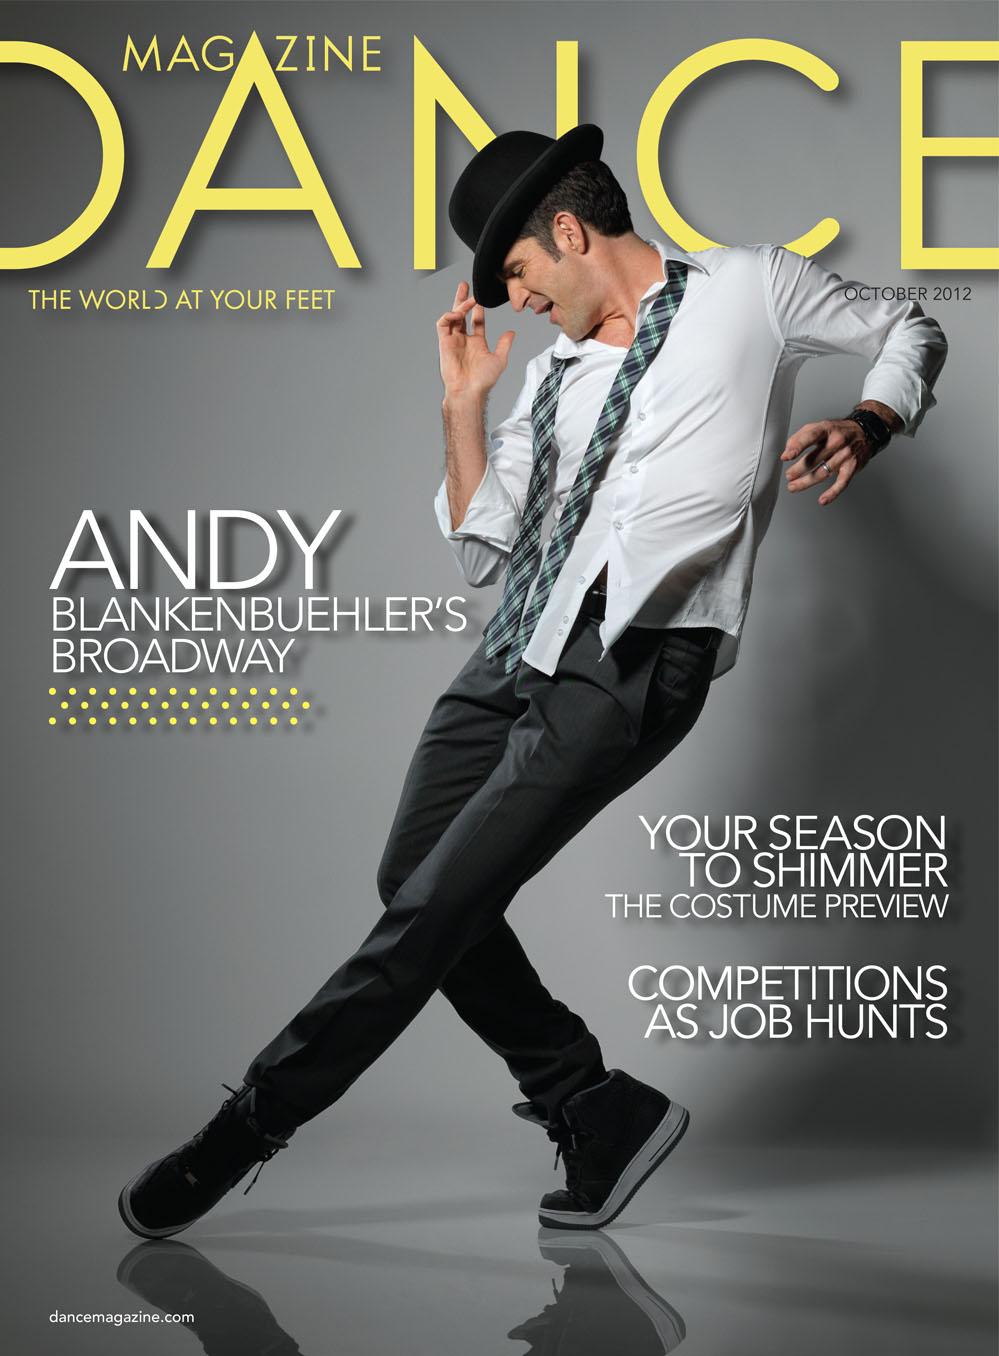 Pin by Helen on Dance magazine in 2020 Dance magazine